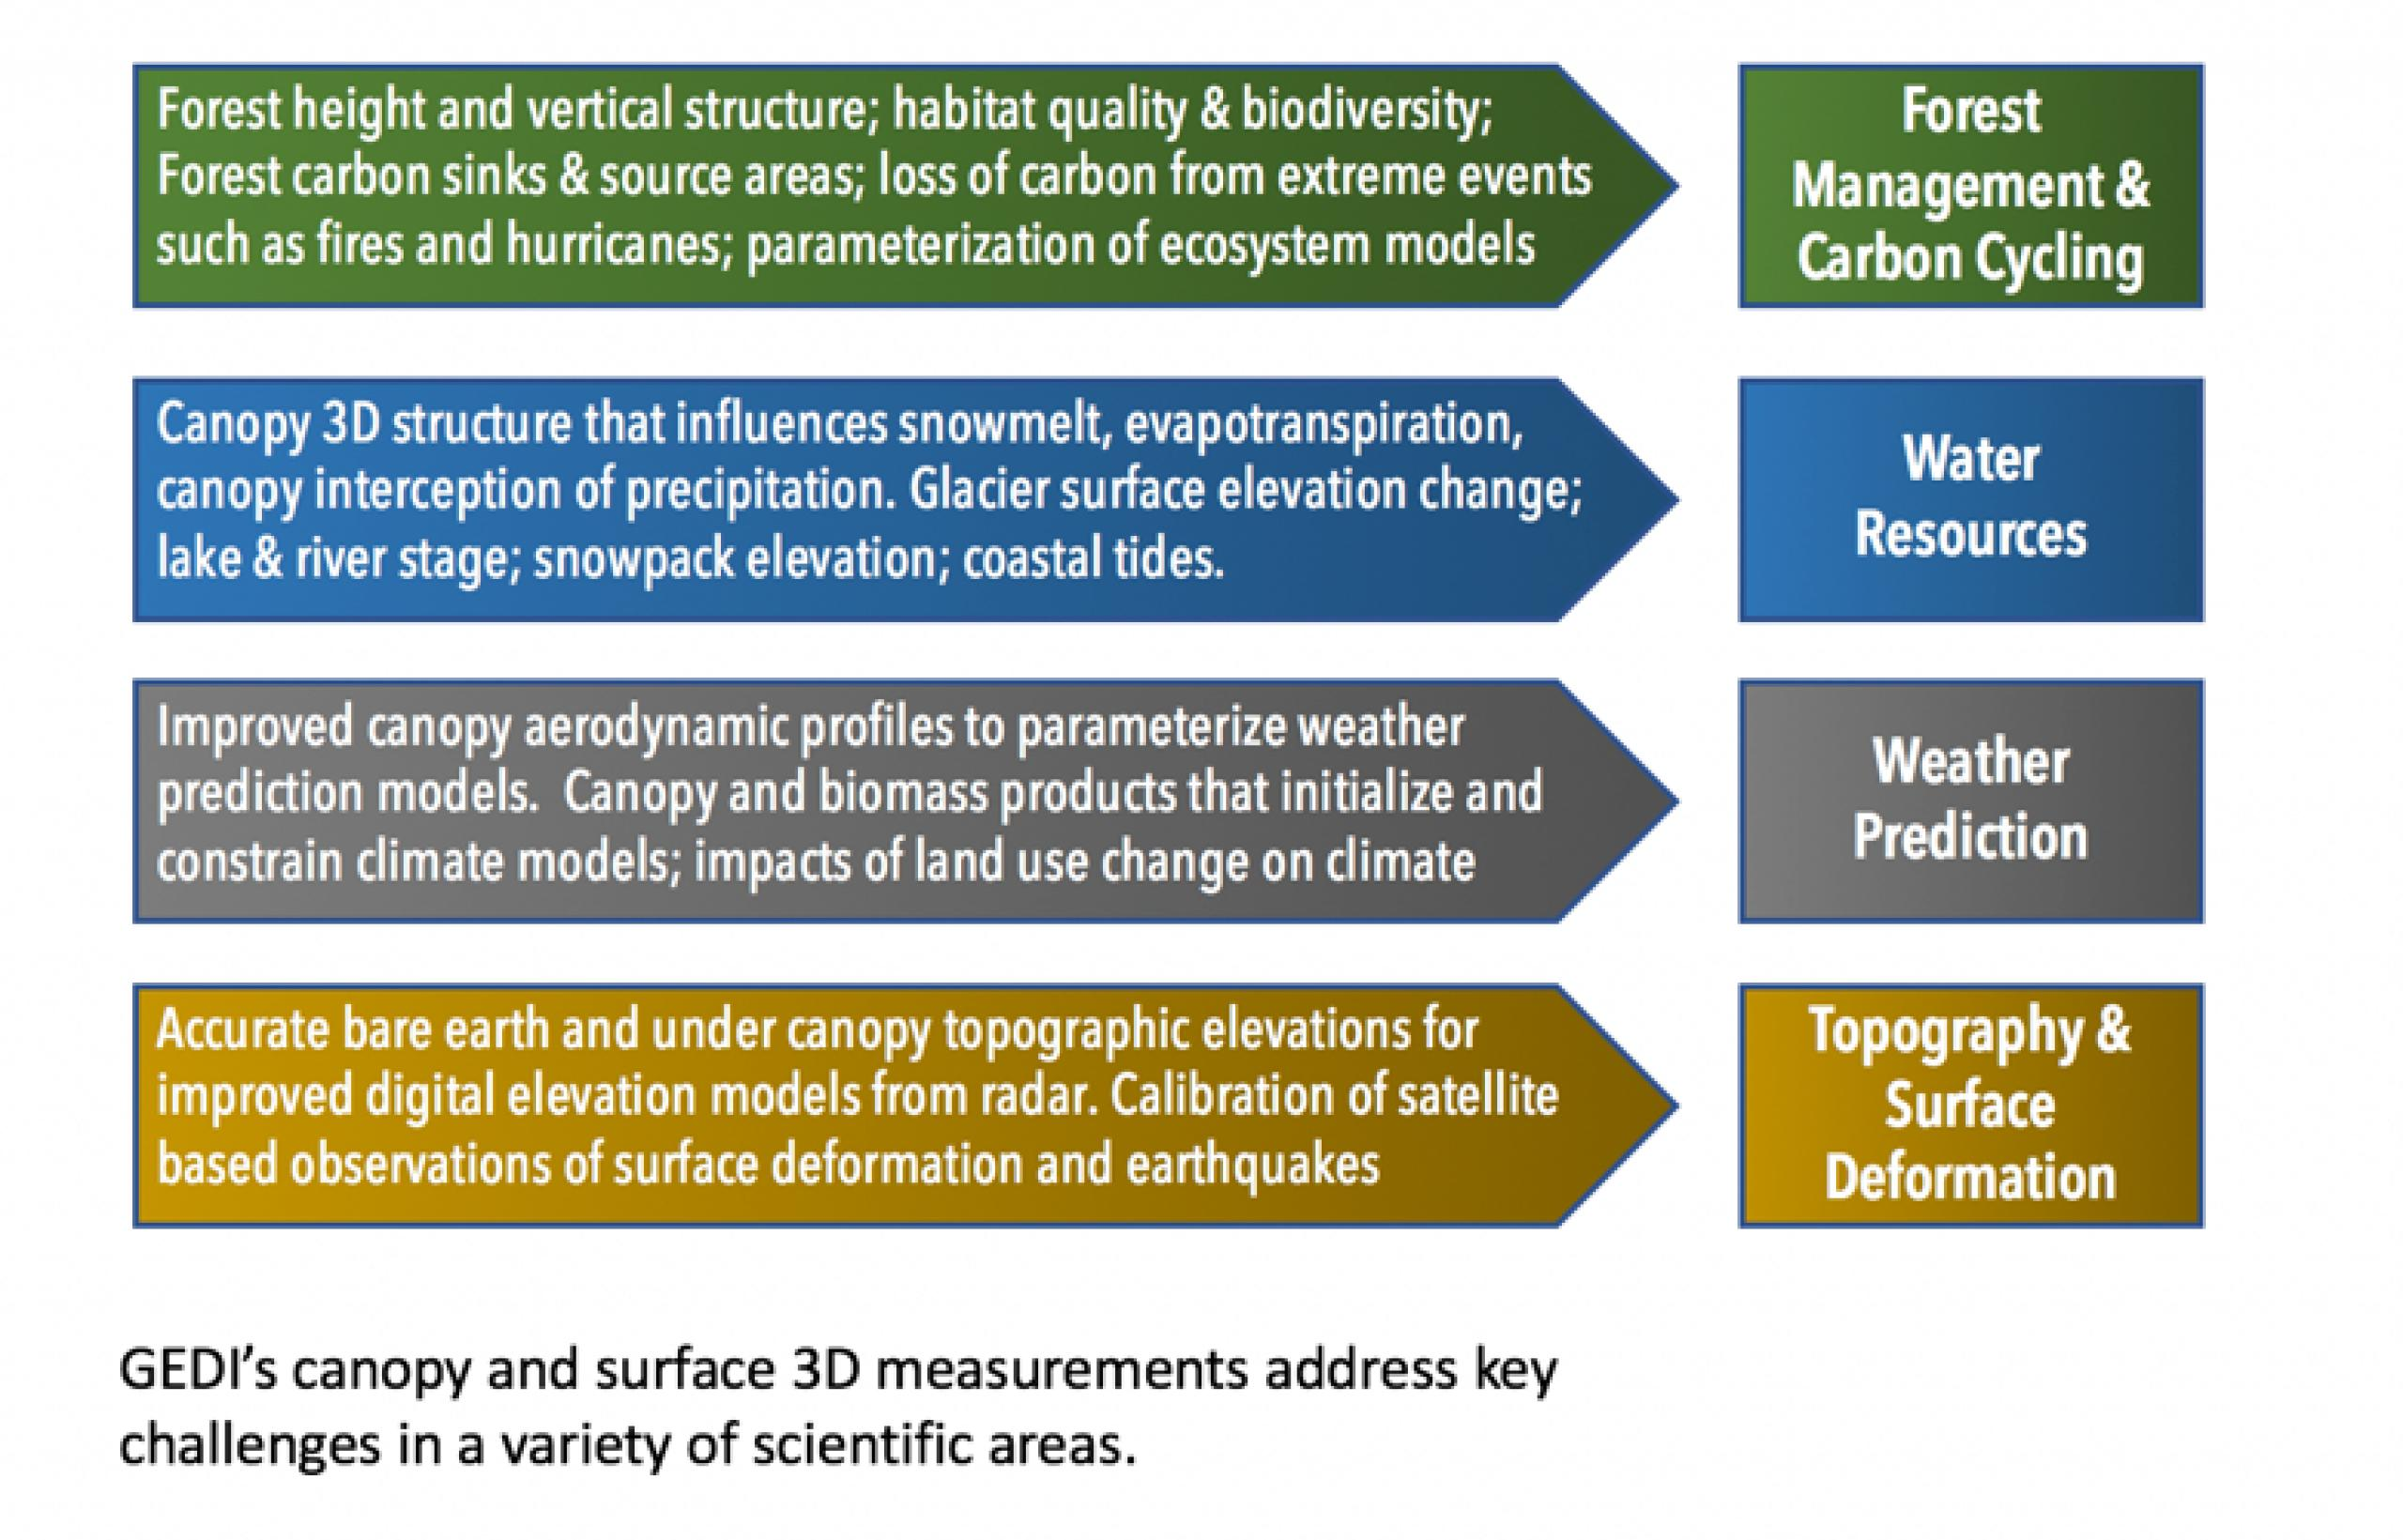 rainforest structure diagram tekonsha voyager 9030 wiring gedi science mission directorate